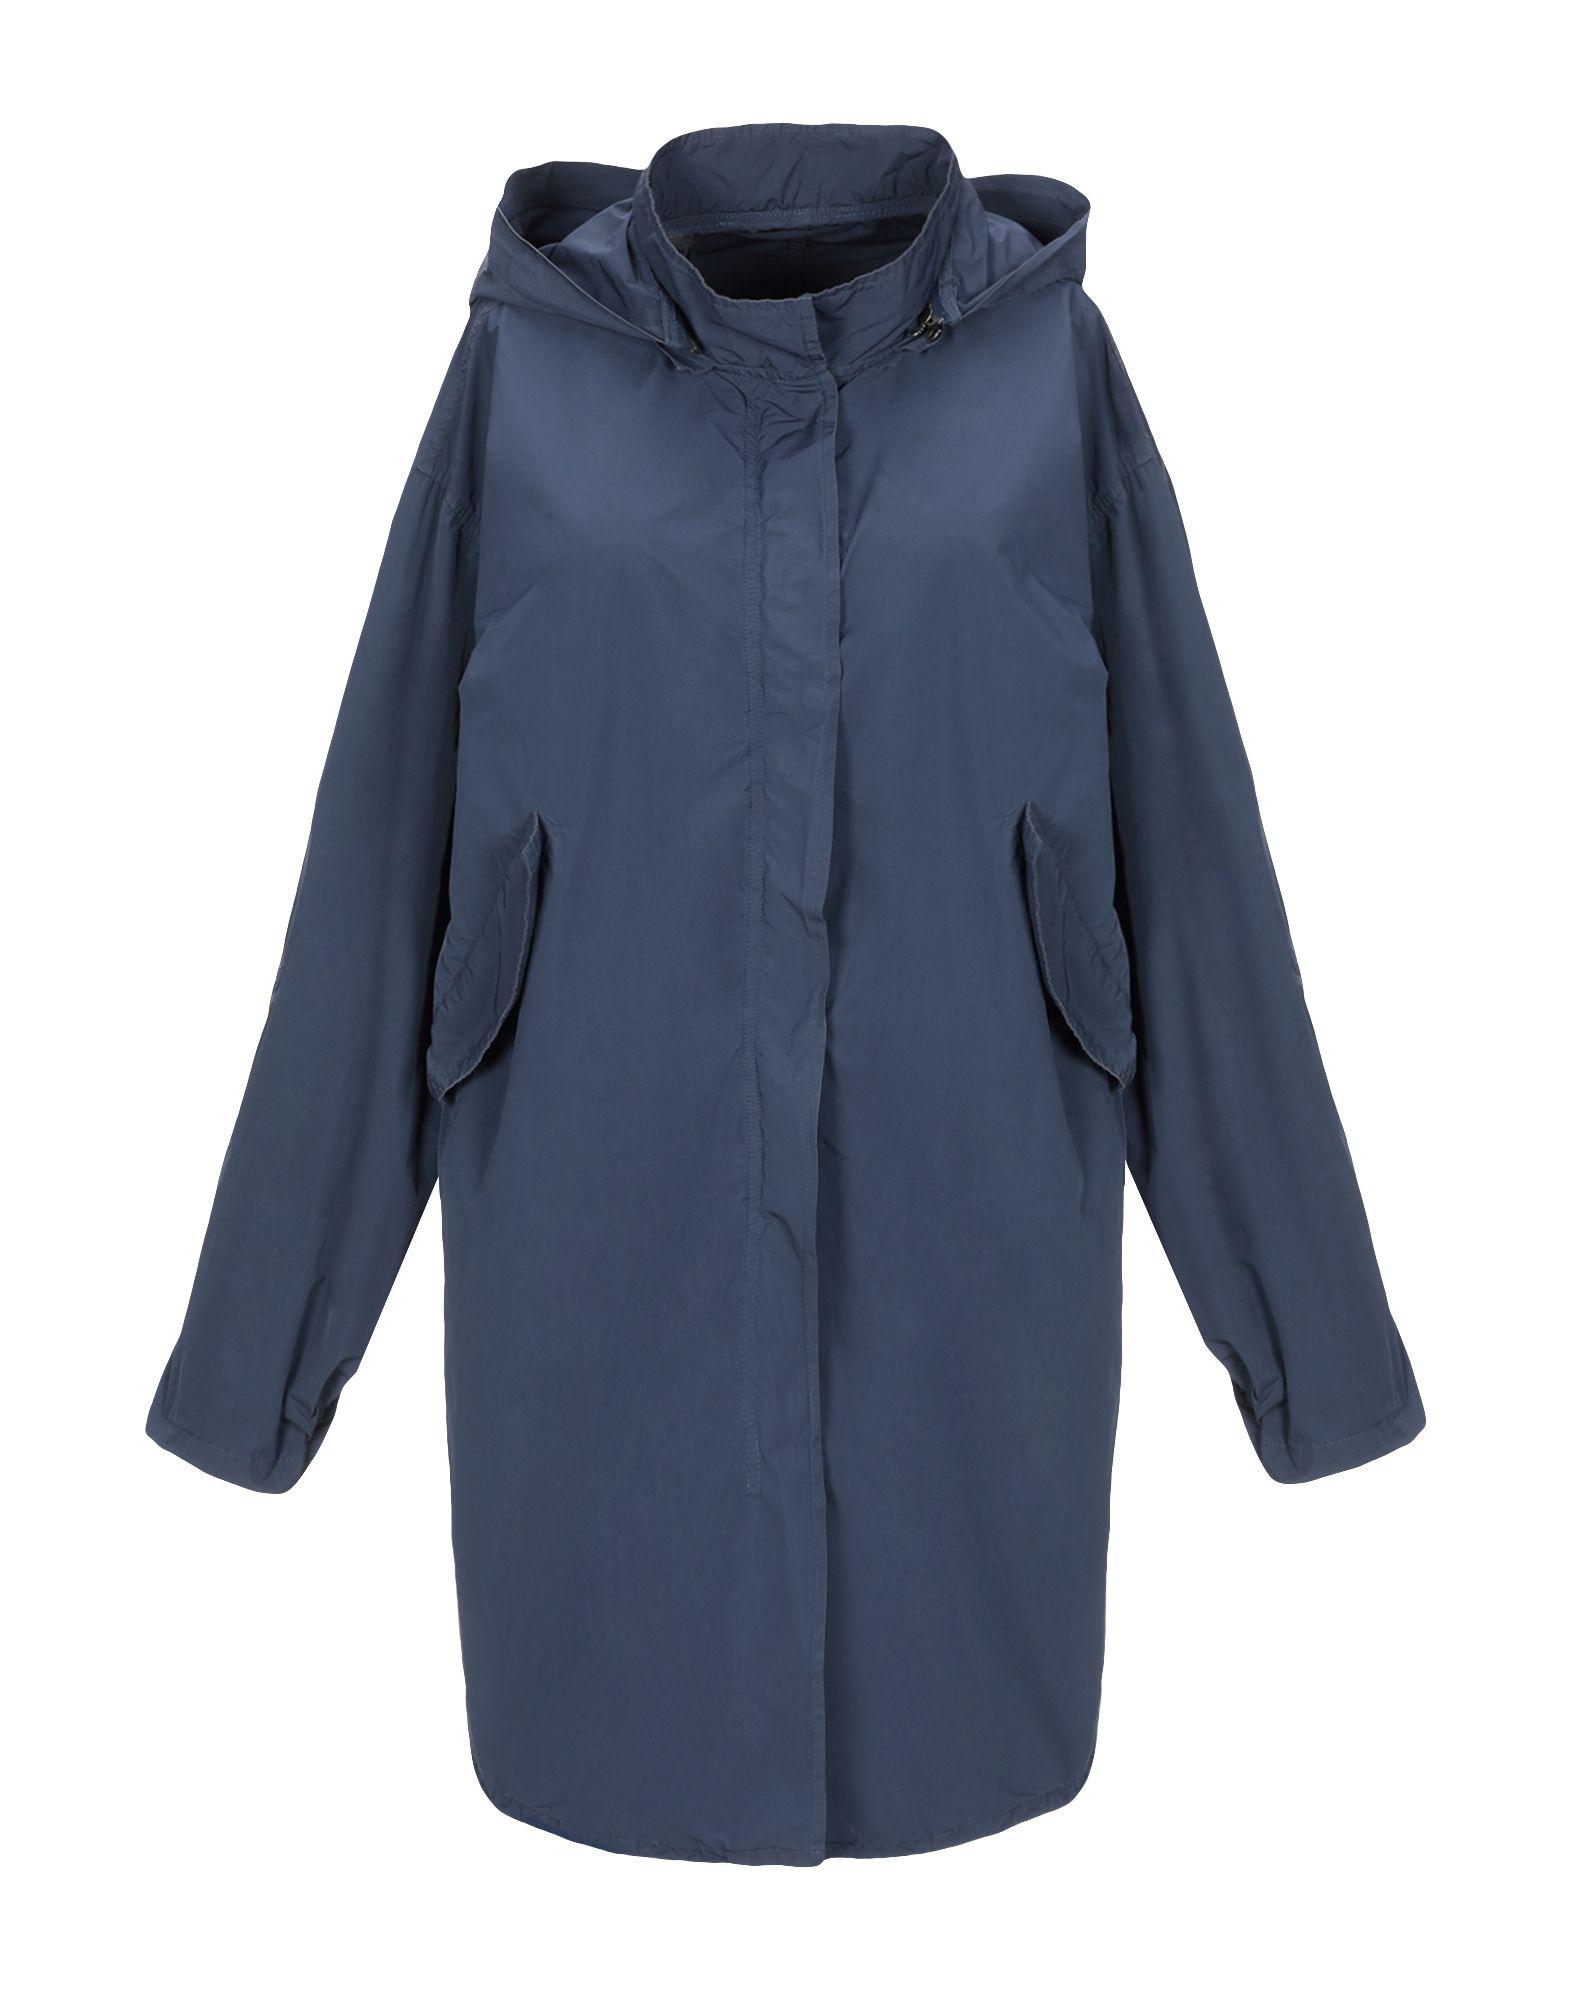 Фото - HOMEWARD CLOTHES Пальто bodysuits modis m182k00021 for baby boys kids clothes children clothes tmallfs